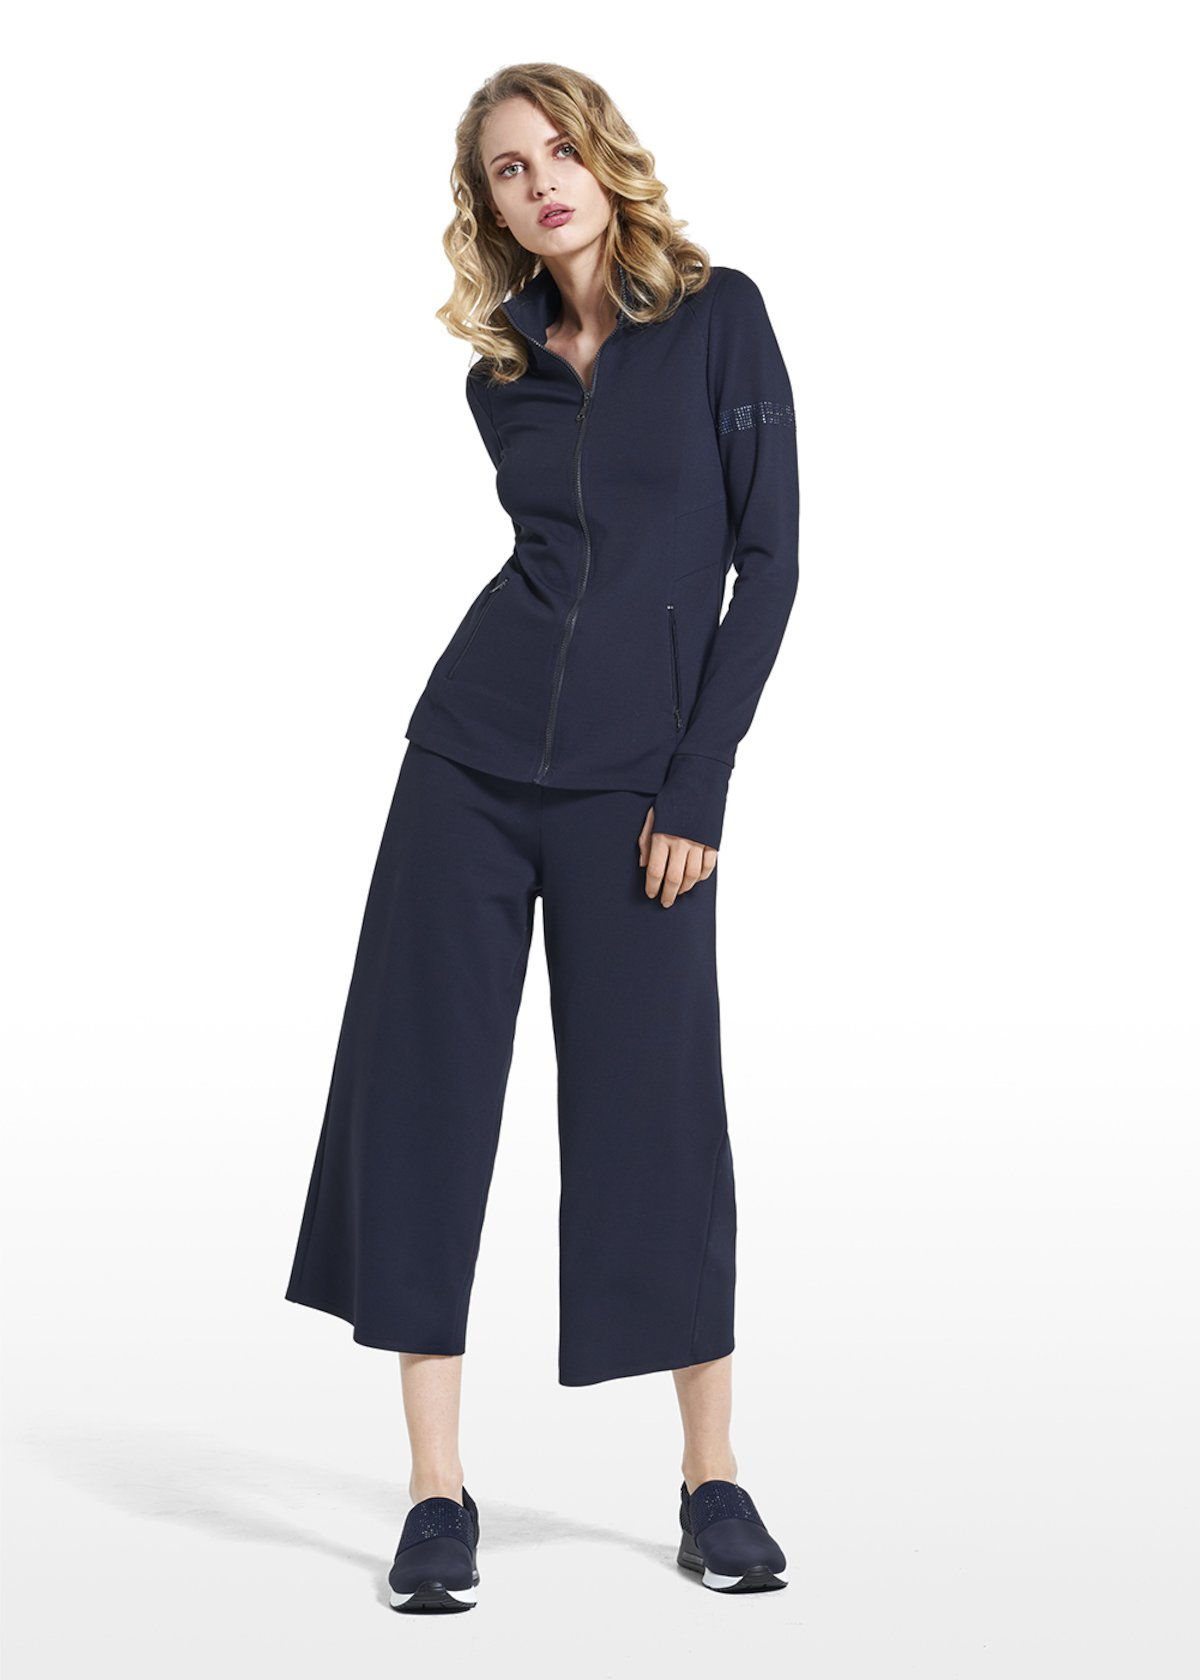 Sweatshirt Fiona in Punto Milano fabric - Dark Blue - Woman - Category image